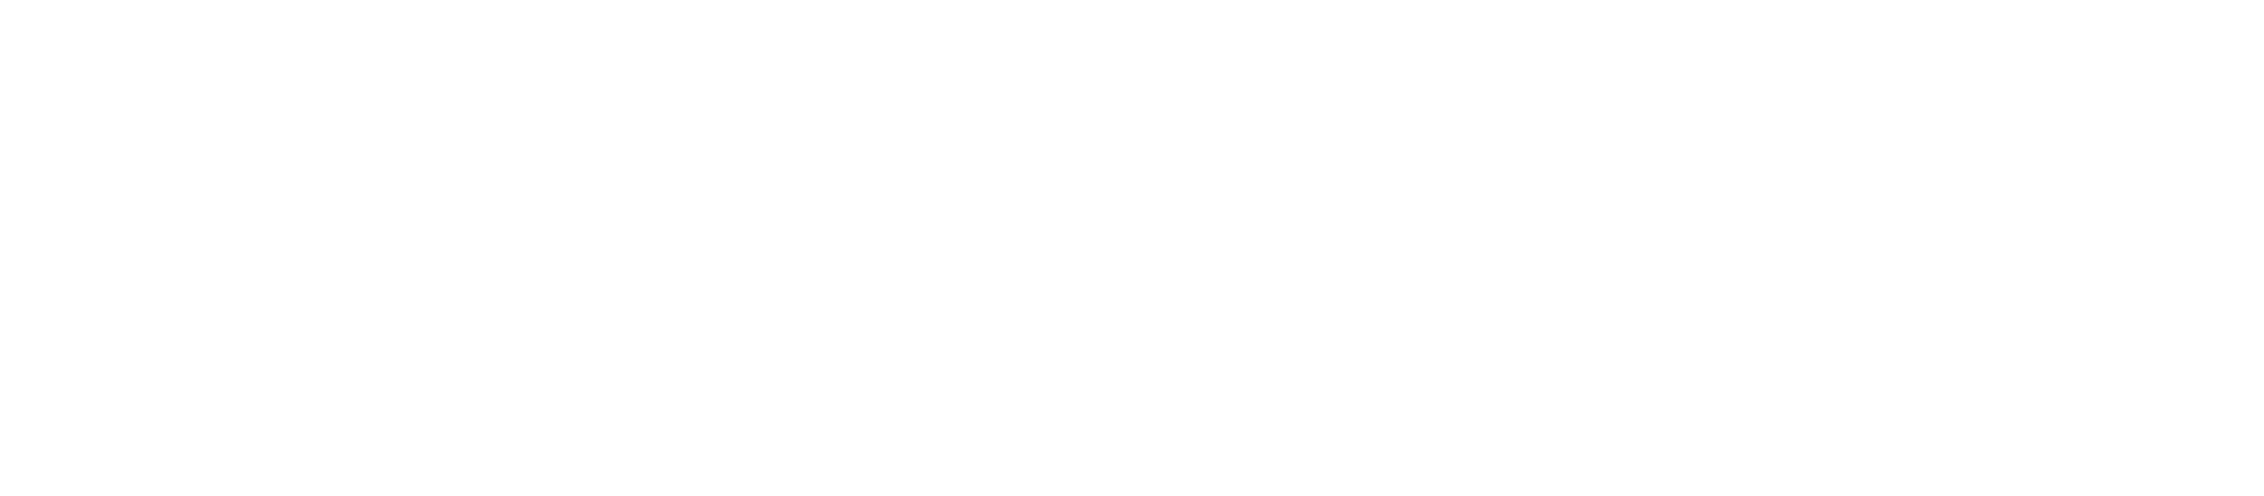 We Kinnect Global Branding Agency Logo